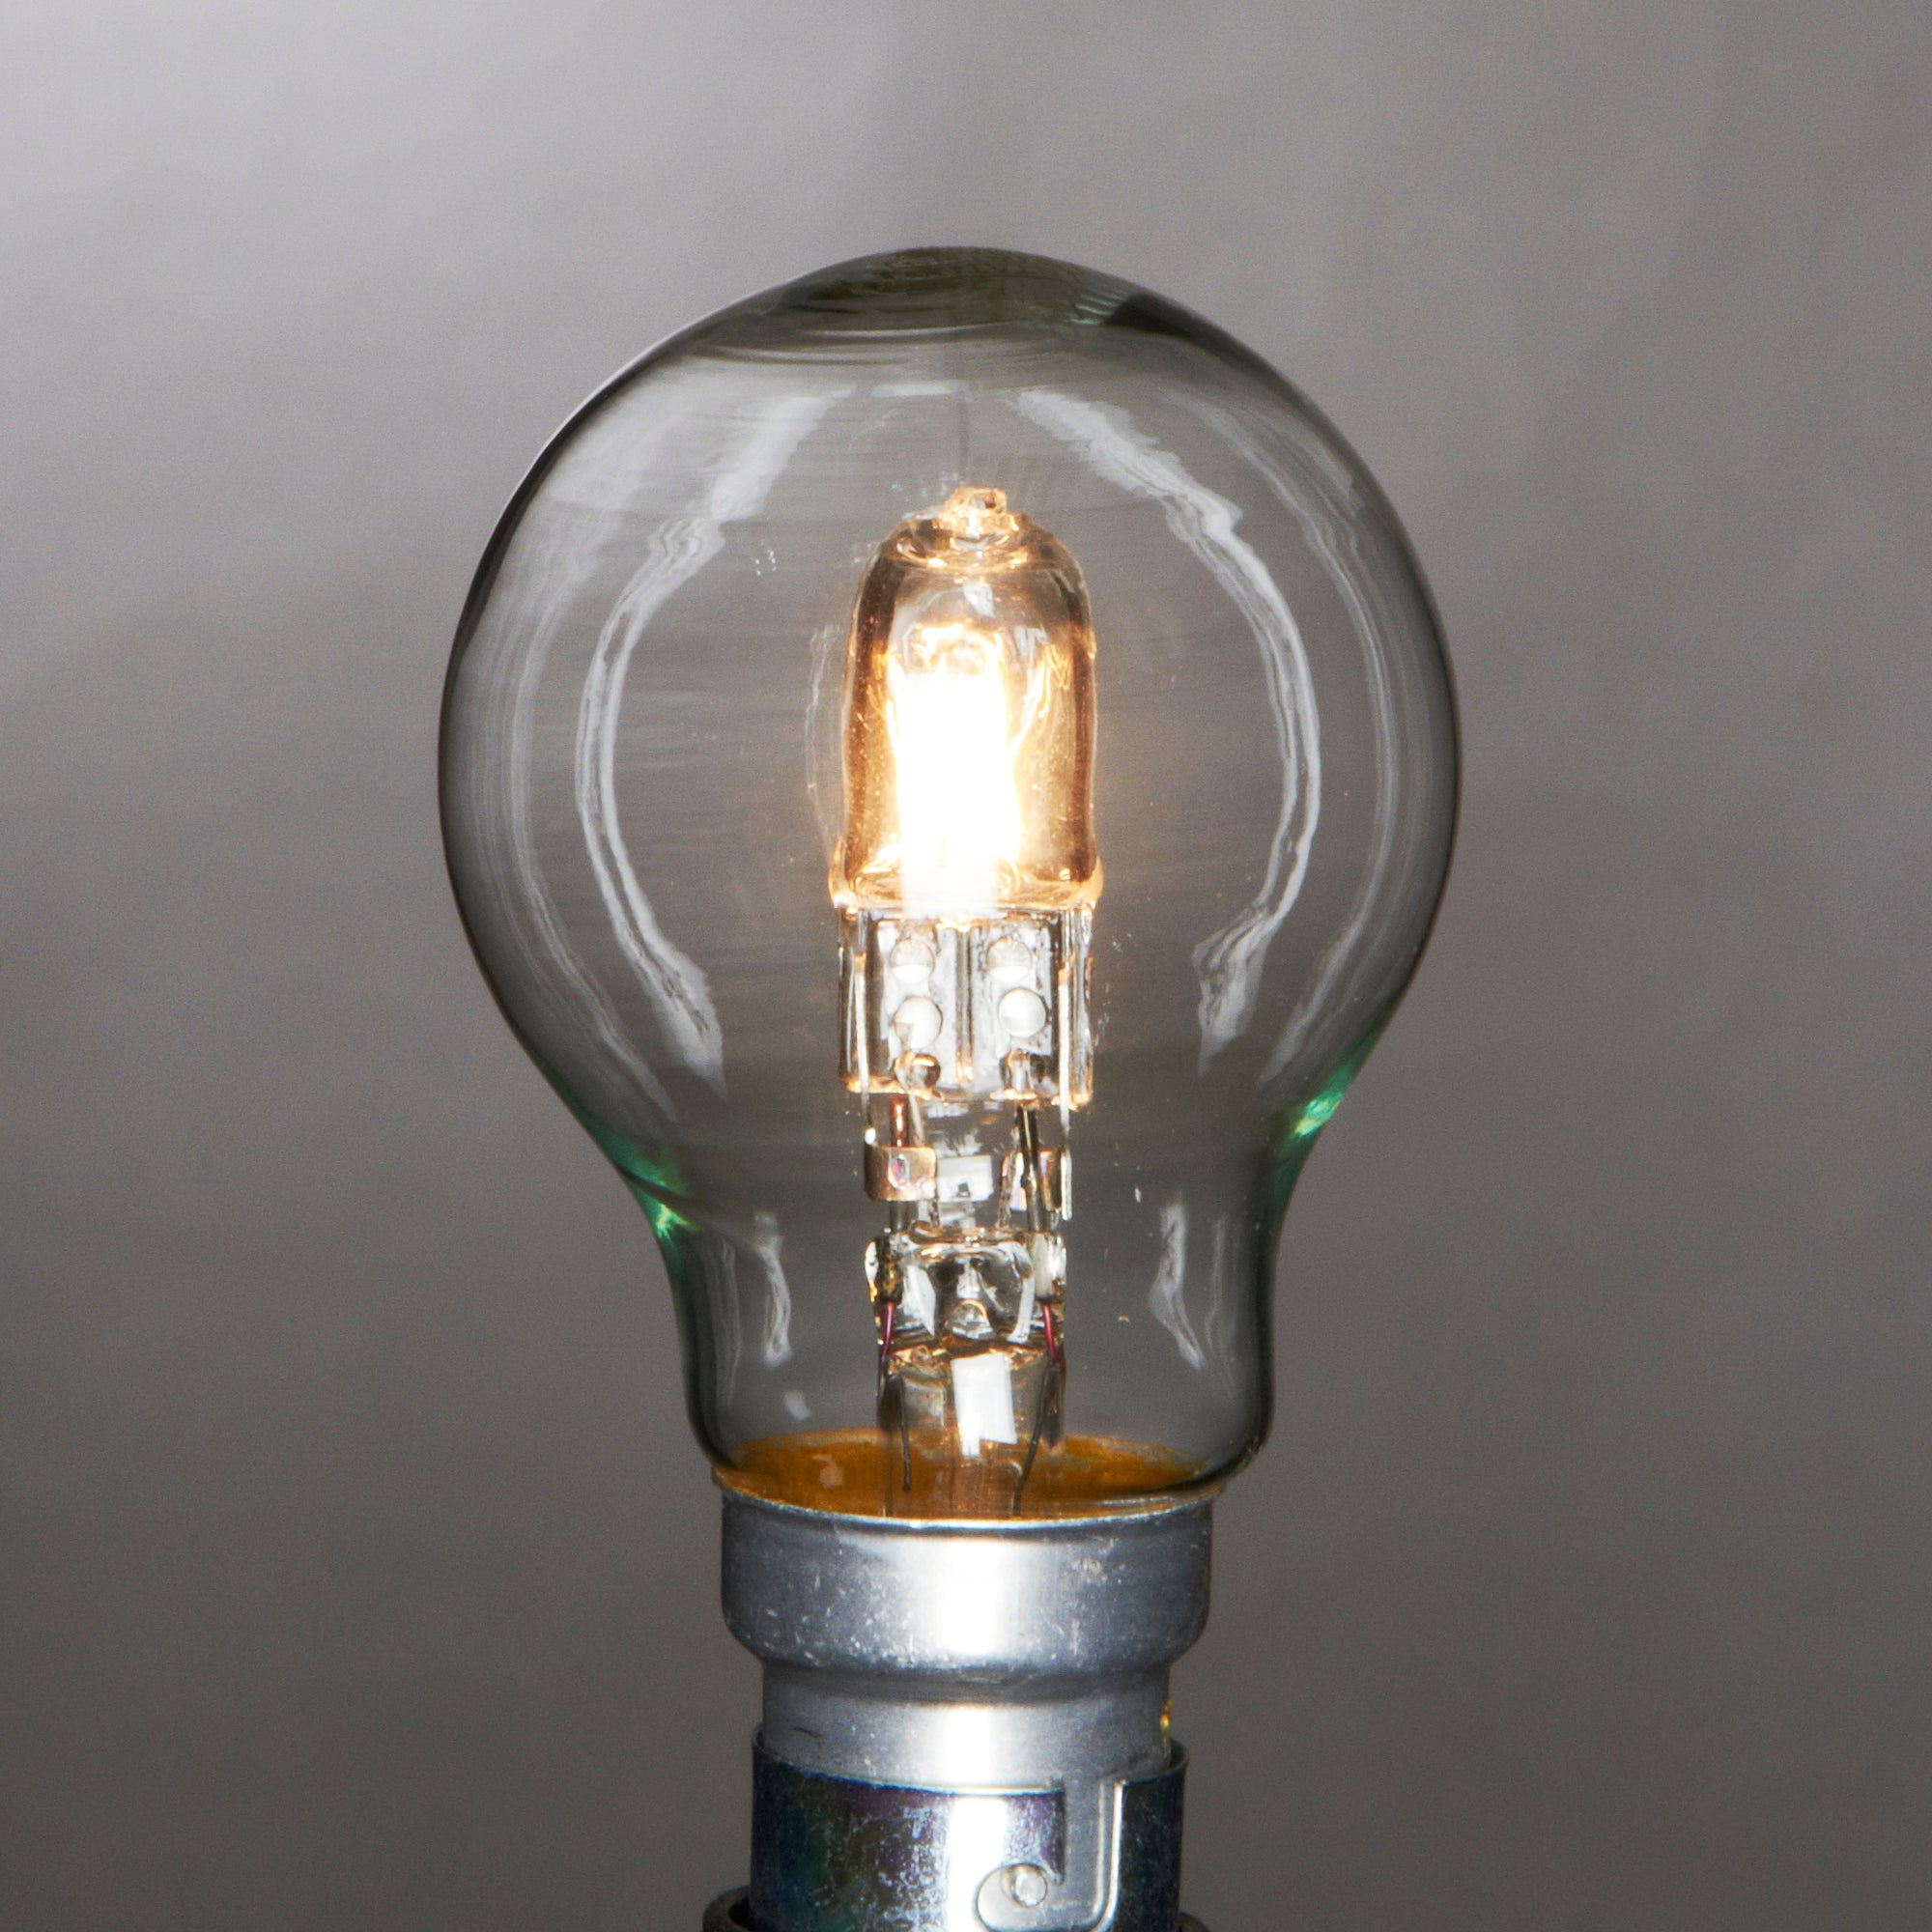 Status Eco Halogen GLS BC 28 Watt Bulb